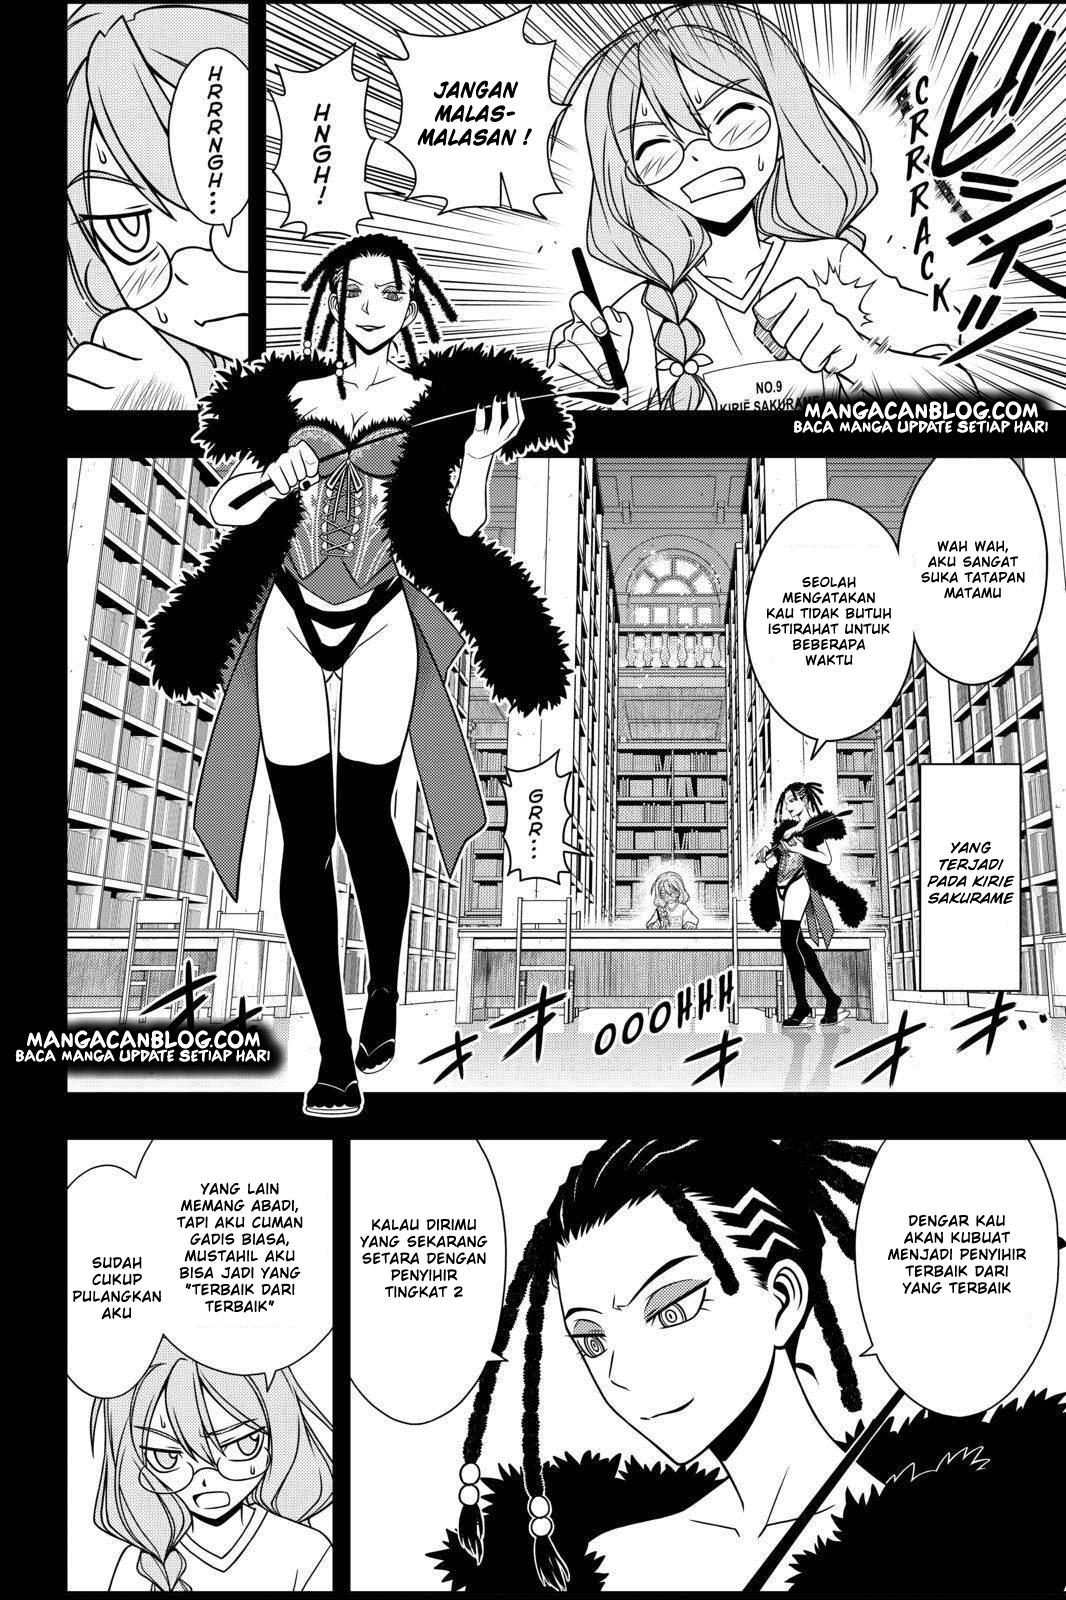 Komik uq holder 082 - semuanya sulit 83 Indonesia uq holder 082 - semuanya sulit Terbaru 6|Baca Manga Komik Indonesia